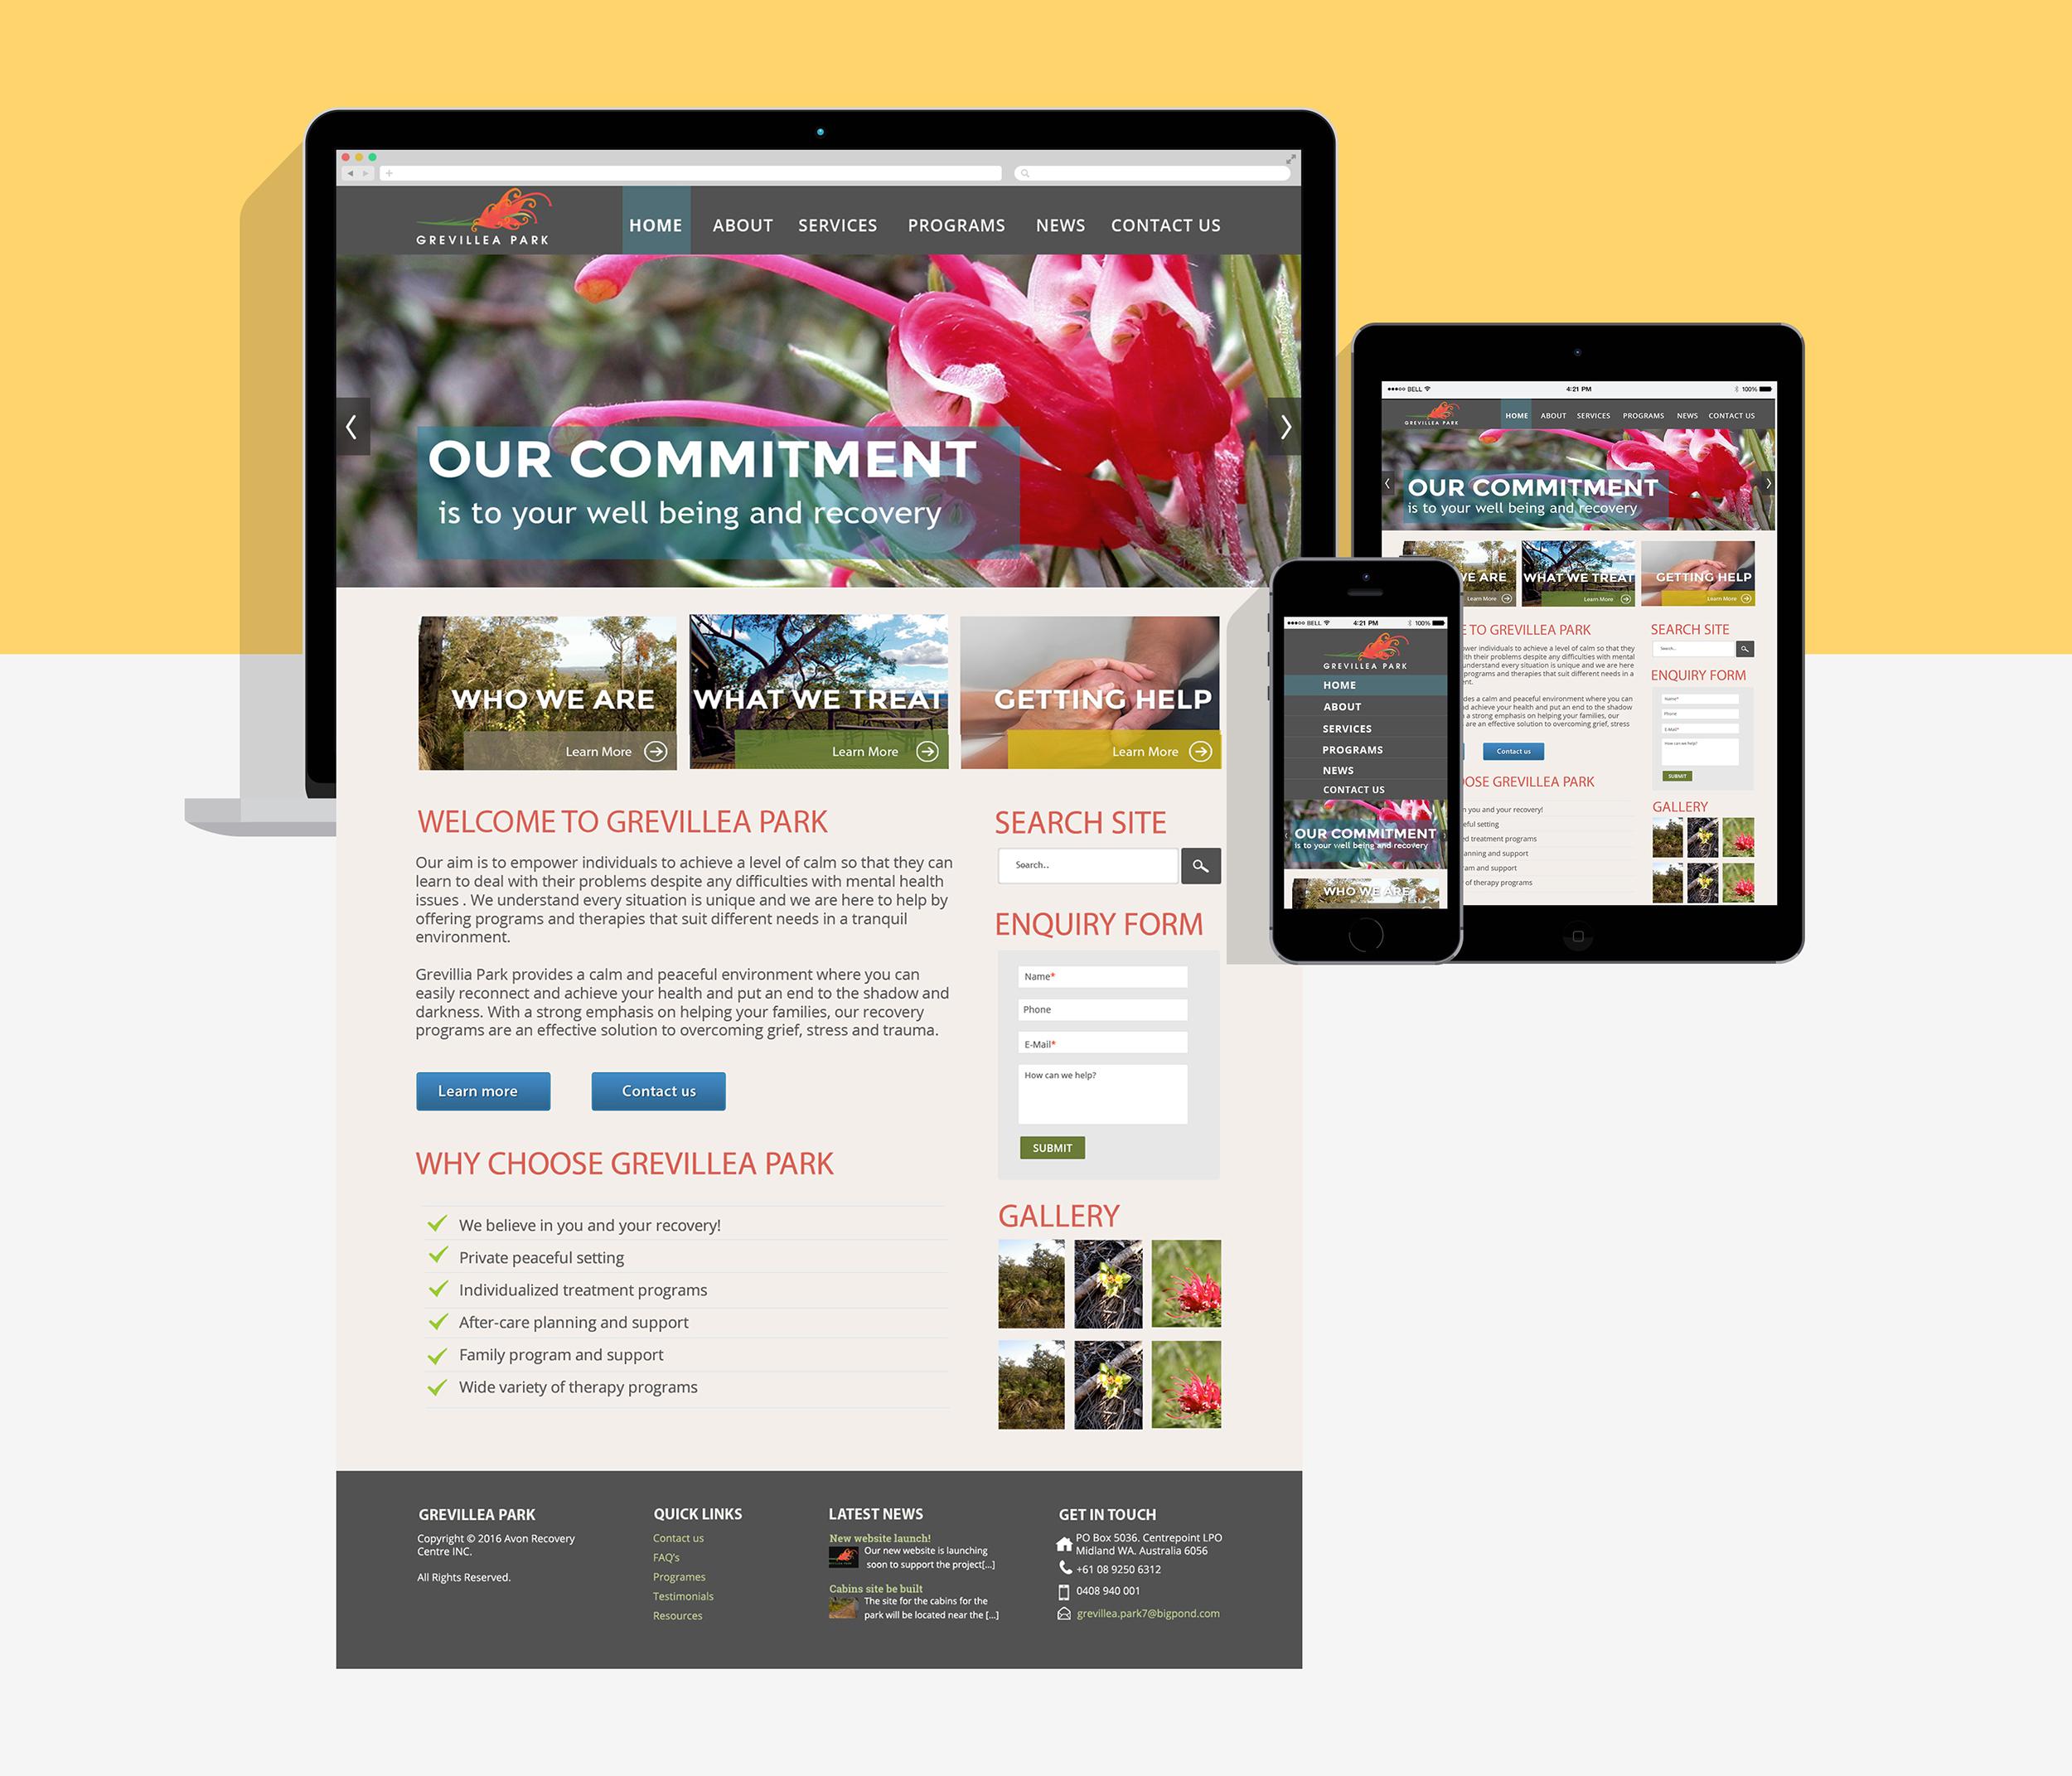 grevillea-park-recovery-website